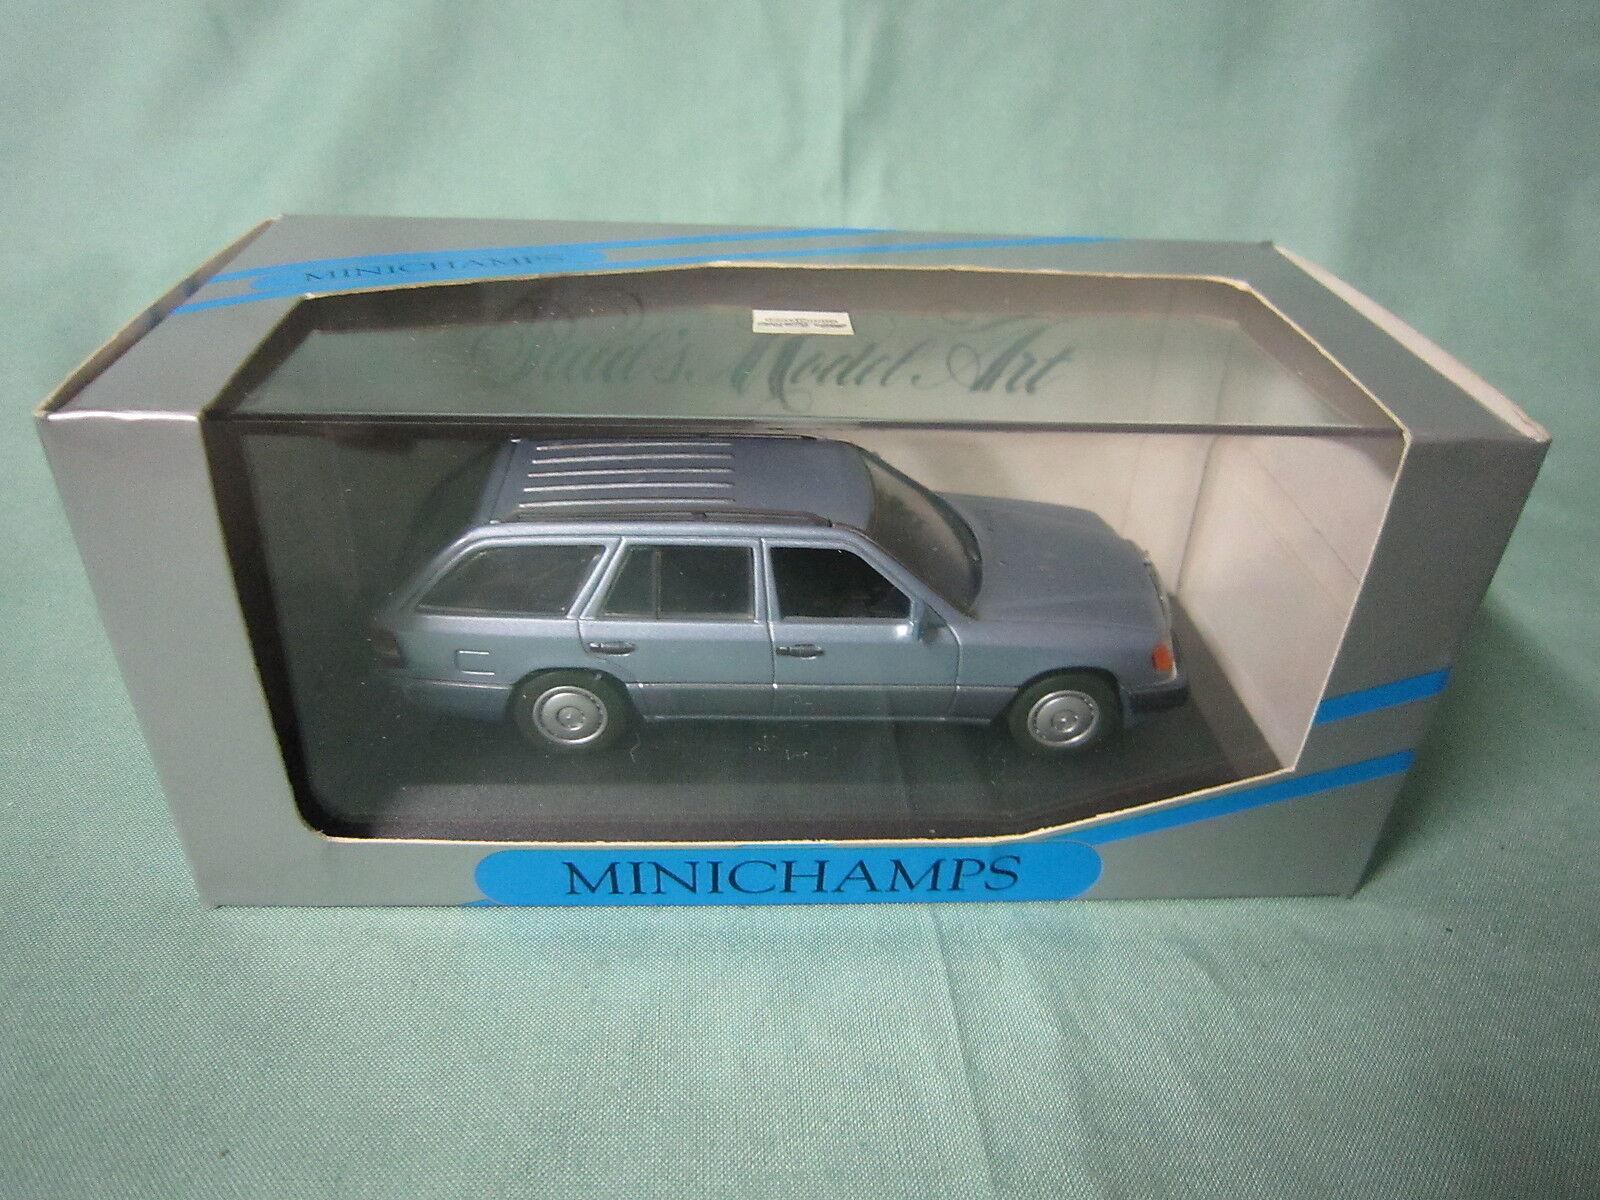 Dv4830 minichamps mercedes - benz 230 te pause 1991 ref 3303 1 43 nb